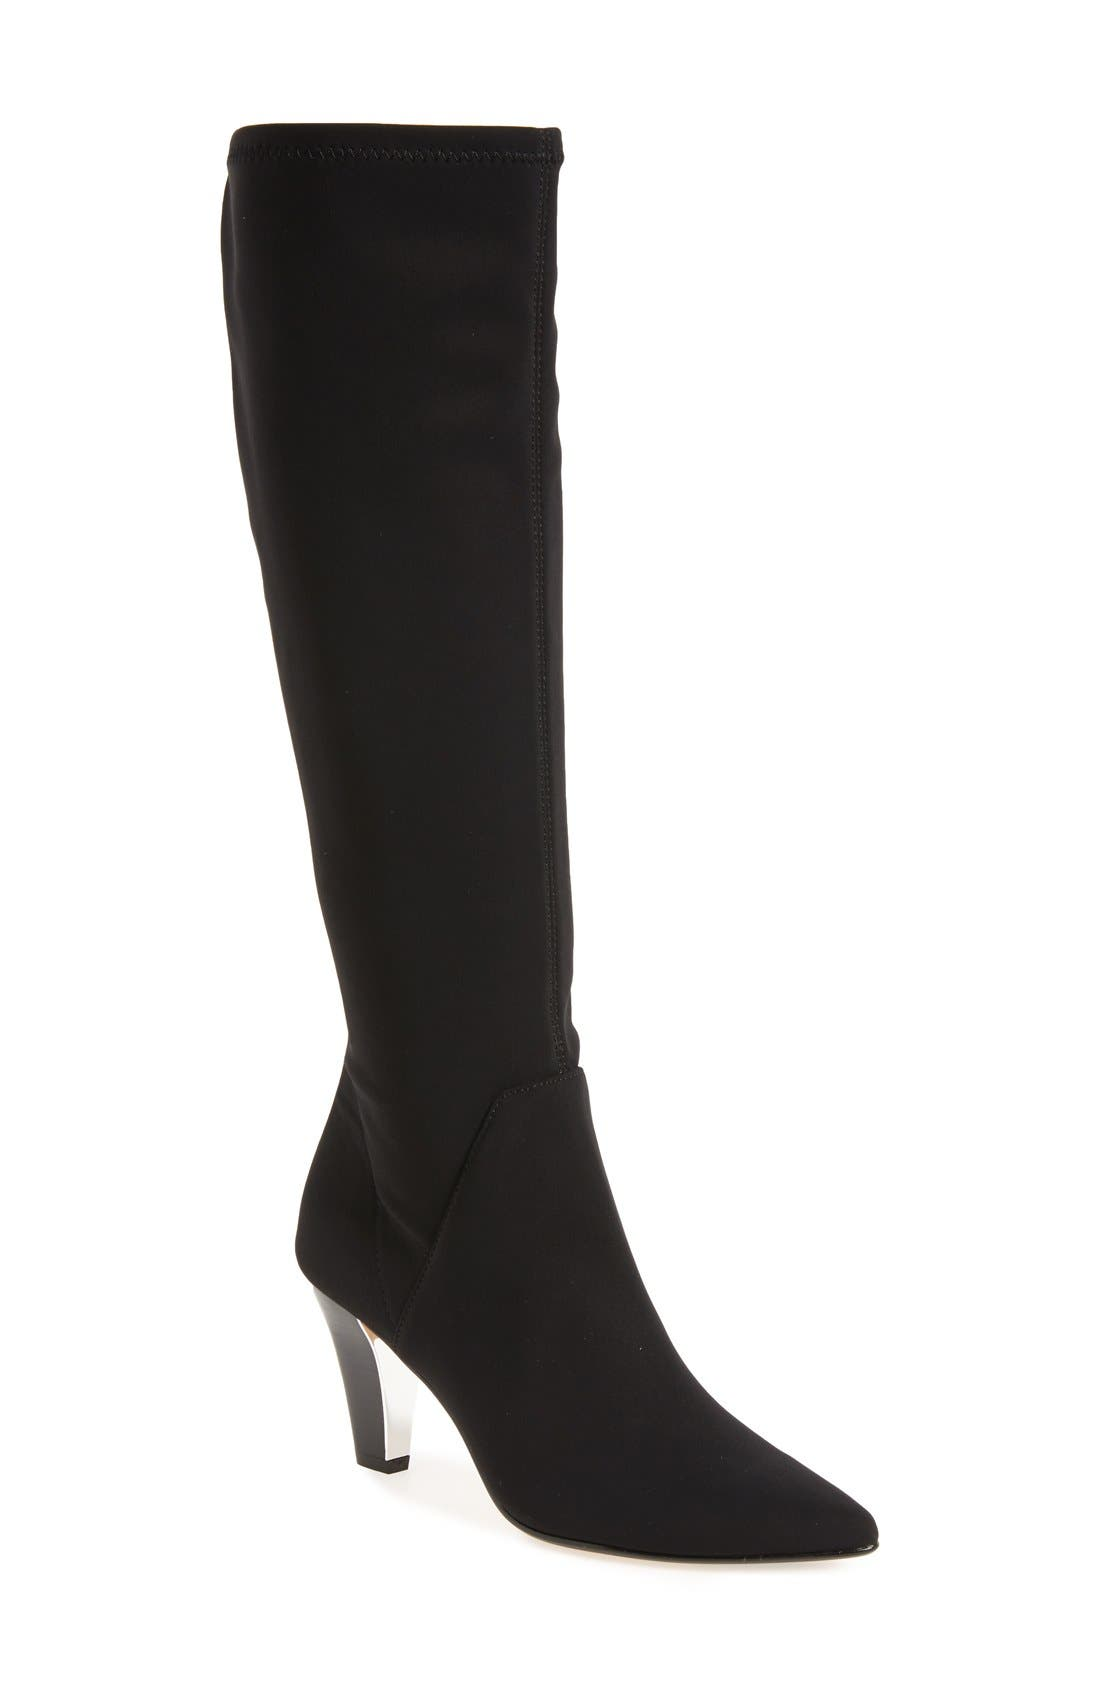 Main Image - Donald J Pliner 'Tessa' Knee High Boot (Women)